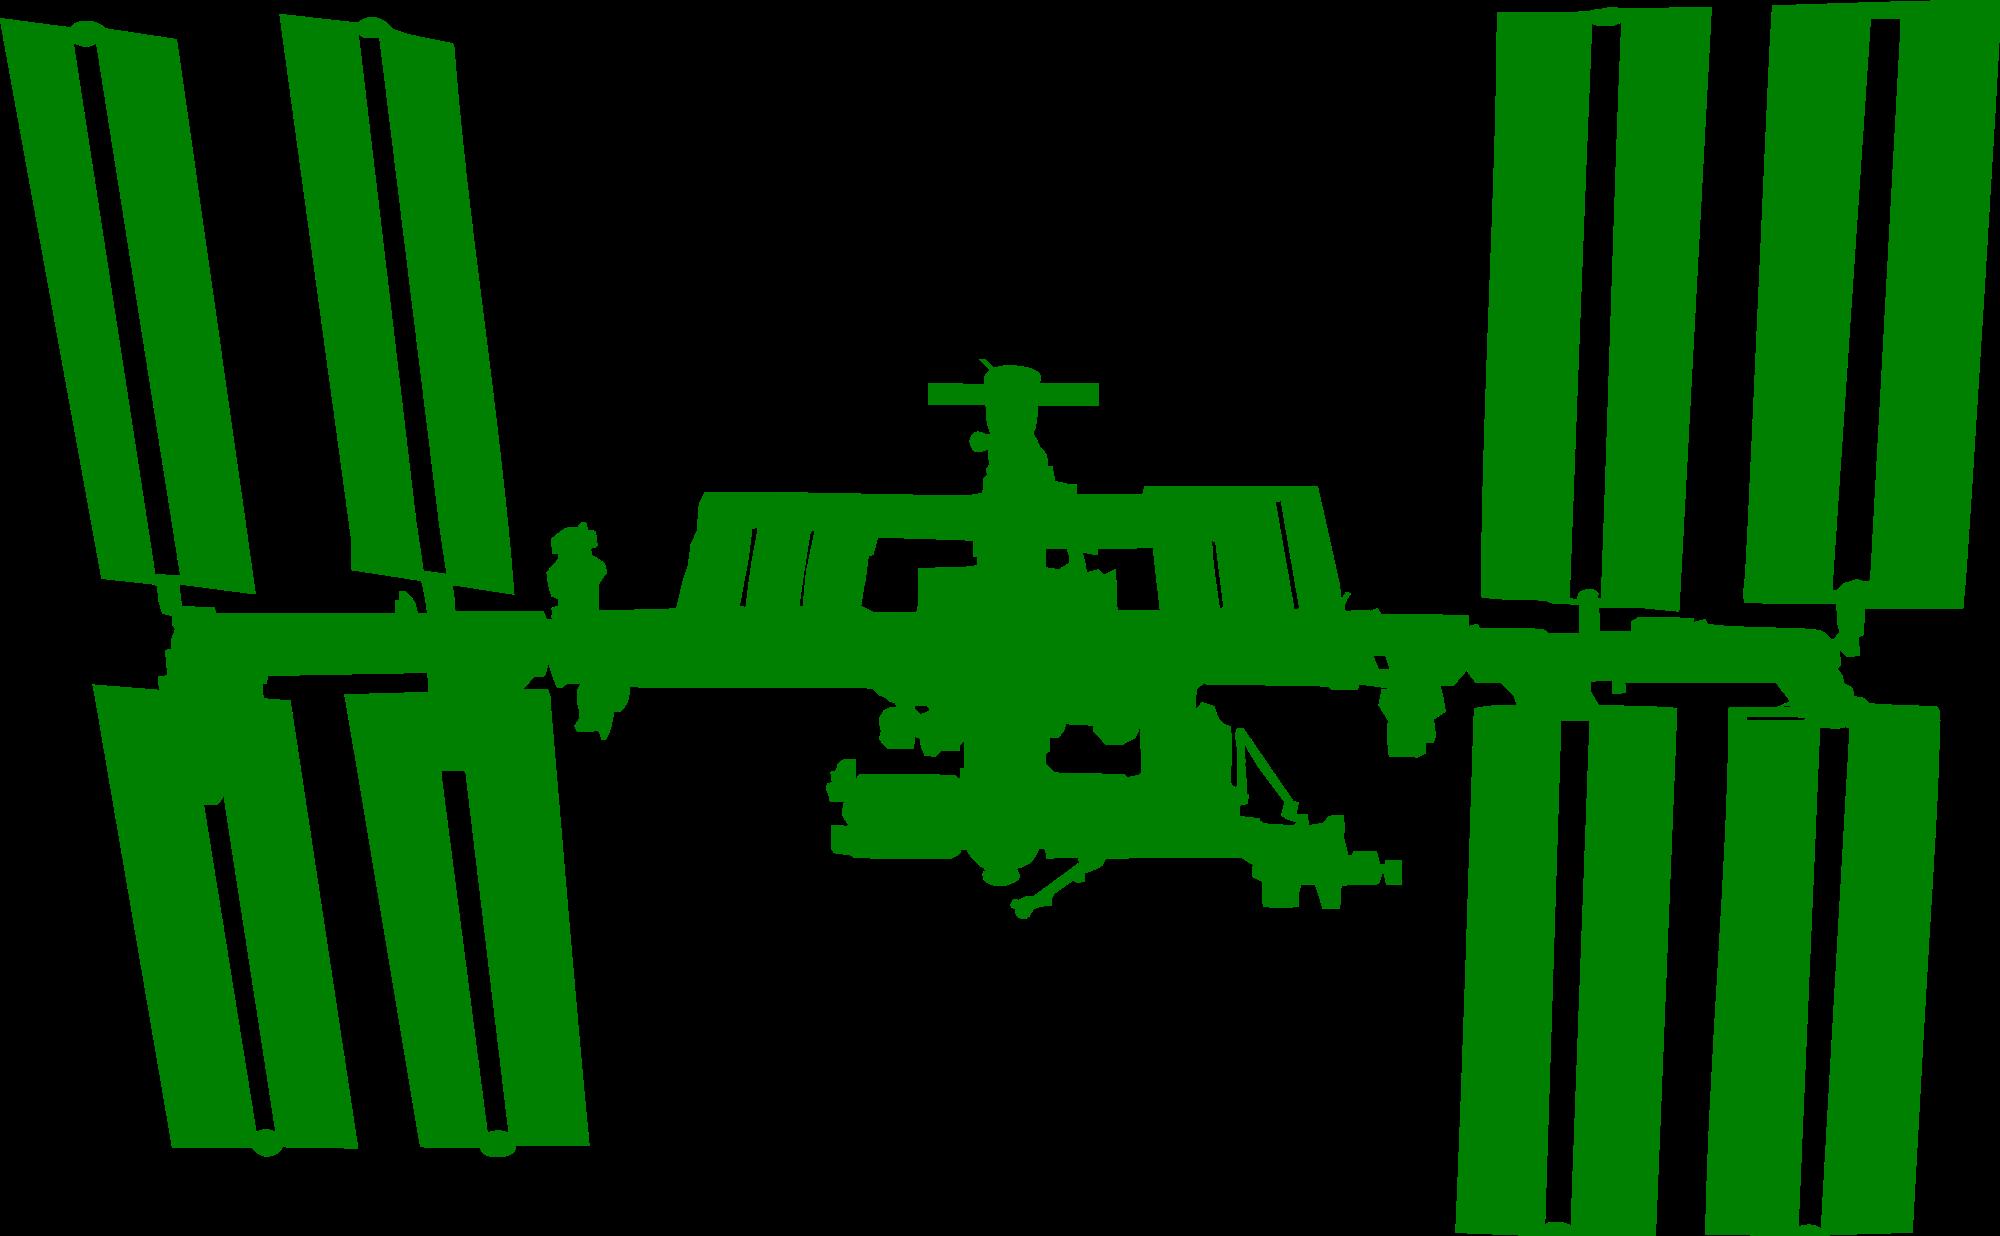 2000x1236 Fileinternational Space Station Silhouette.svg